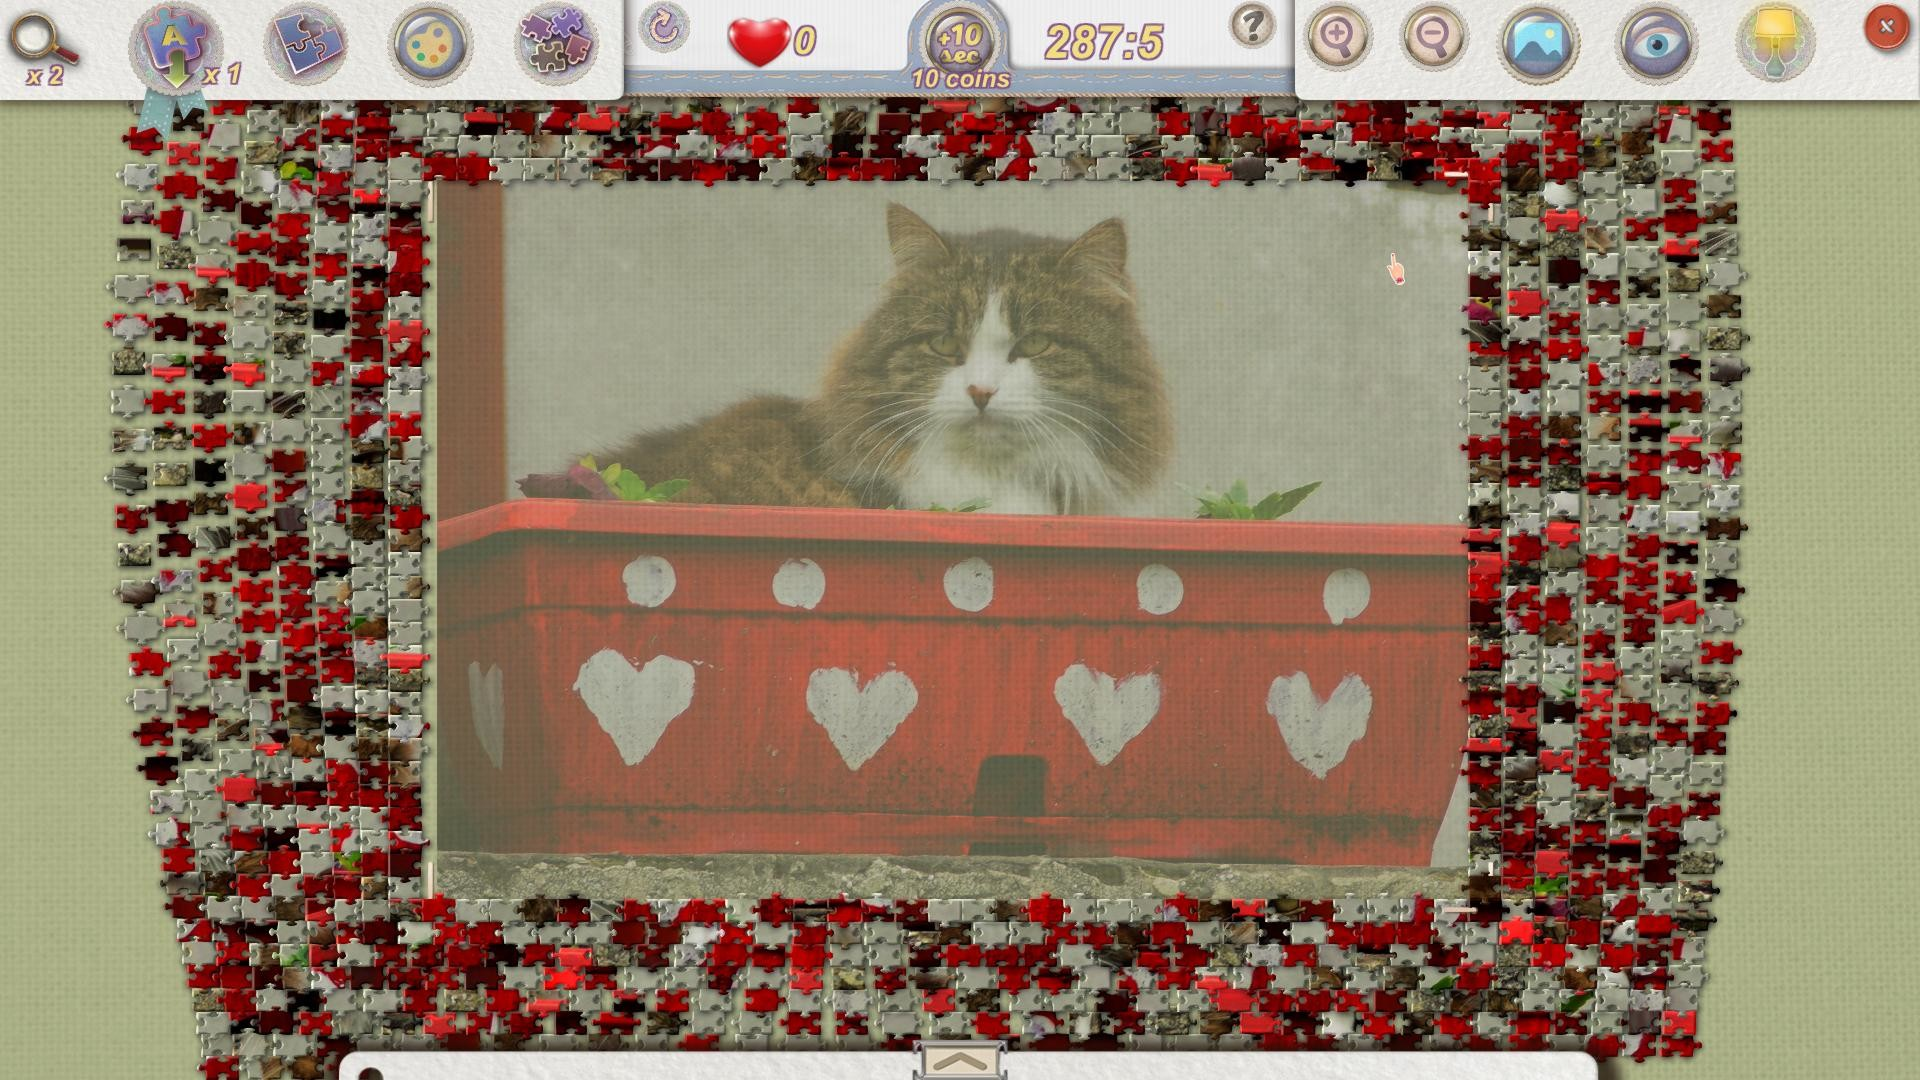 Jigsaw Pieces - Valentine's Day screenshot